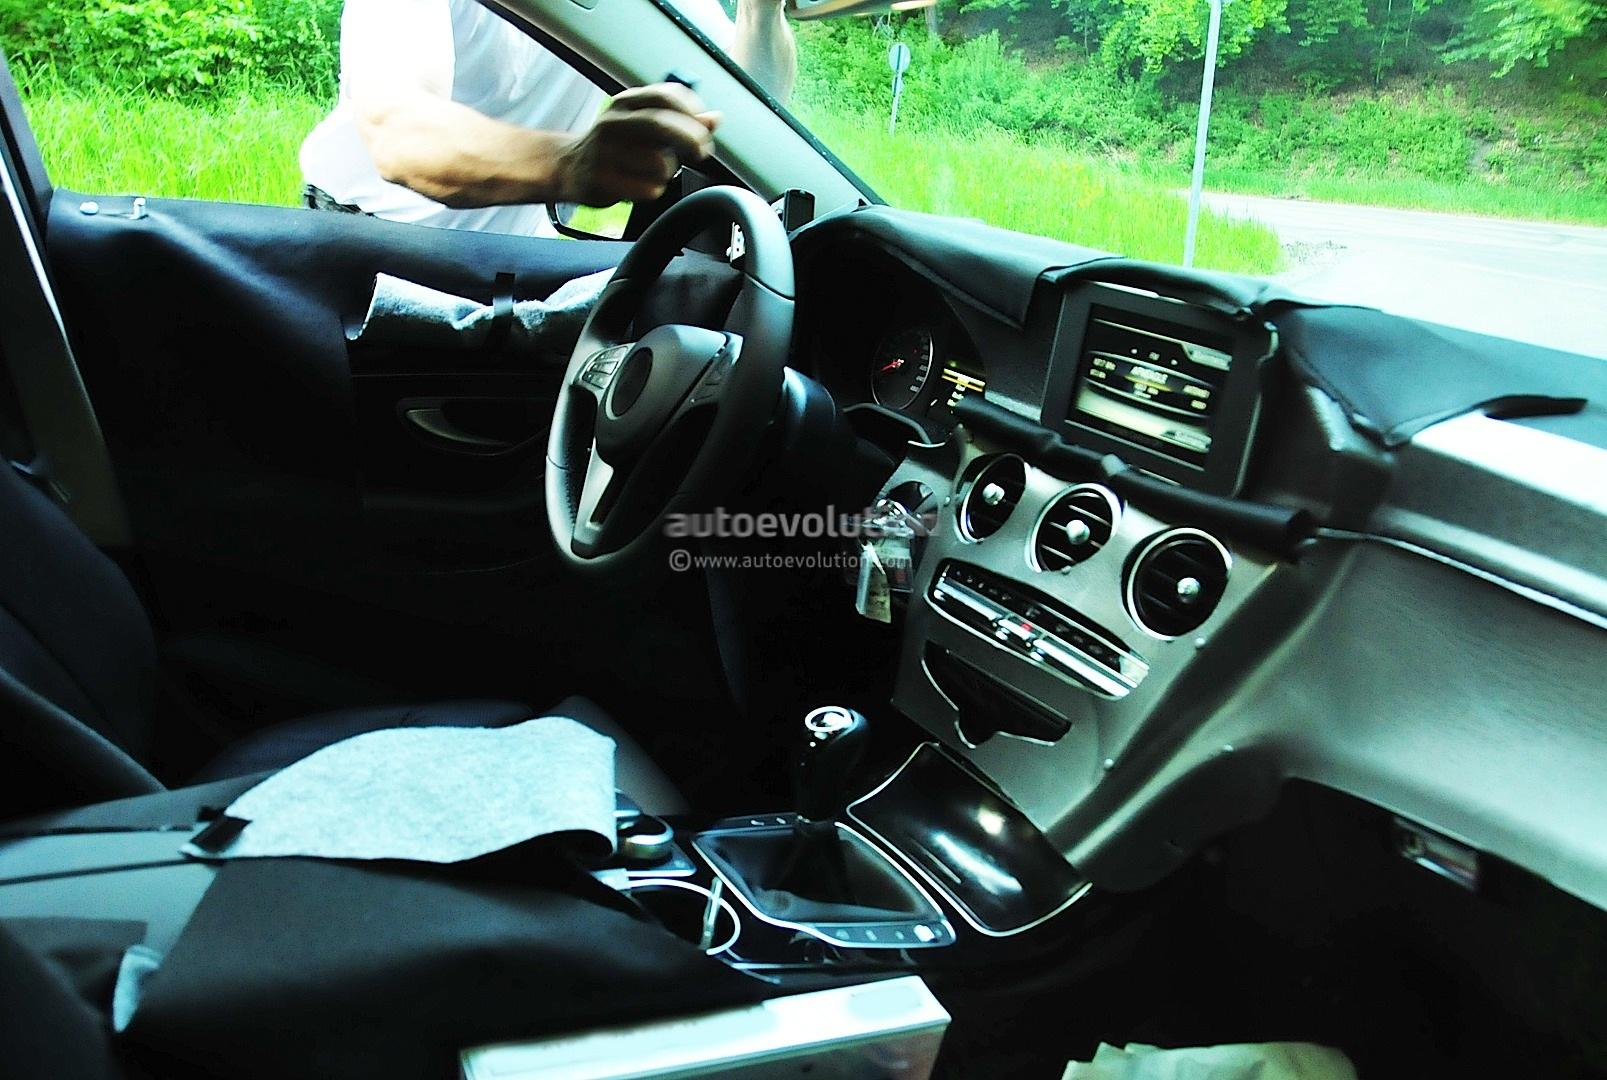 Spyshots: 2014 Mercedes Benz C-Class Interior